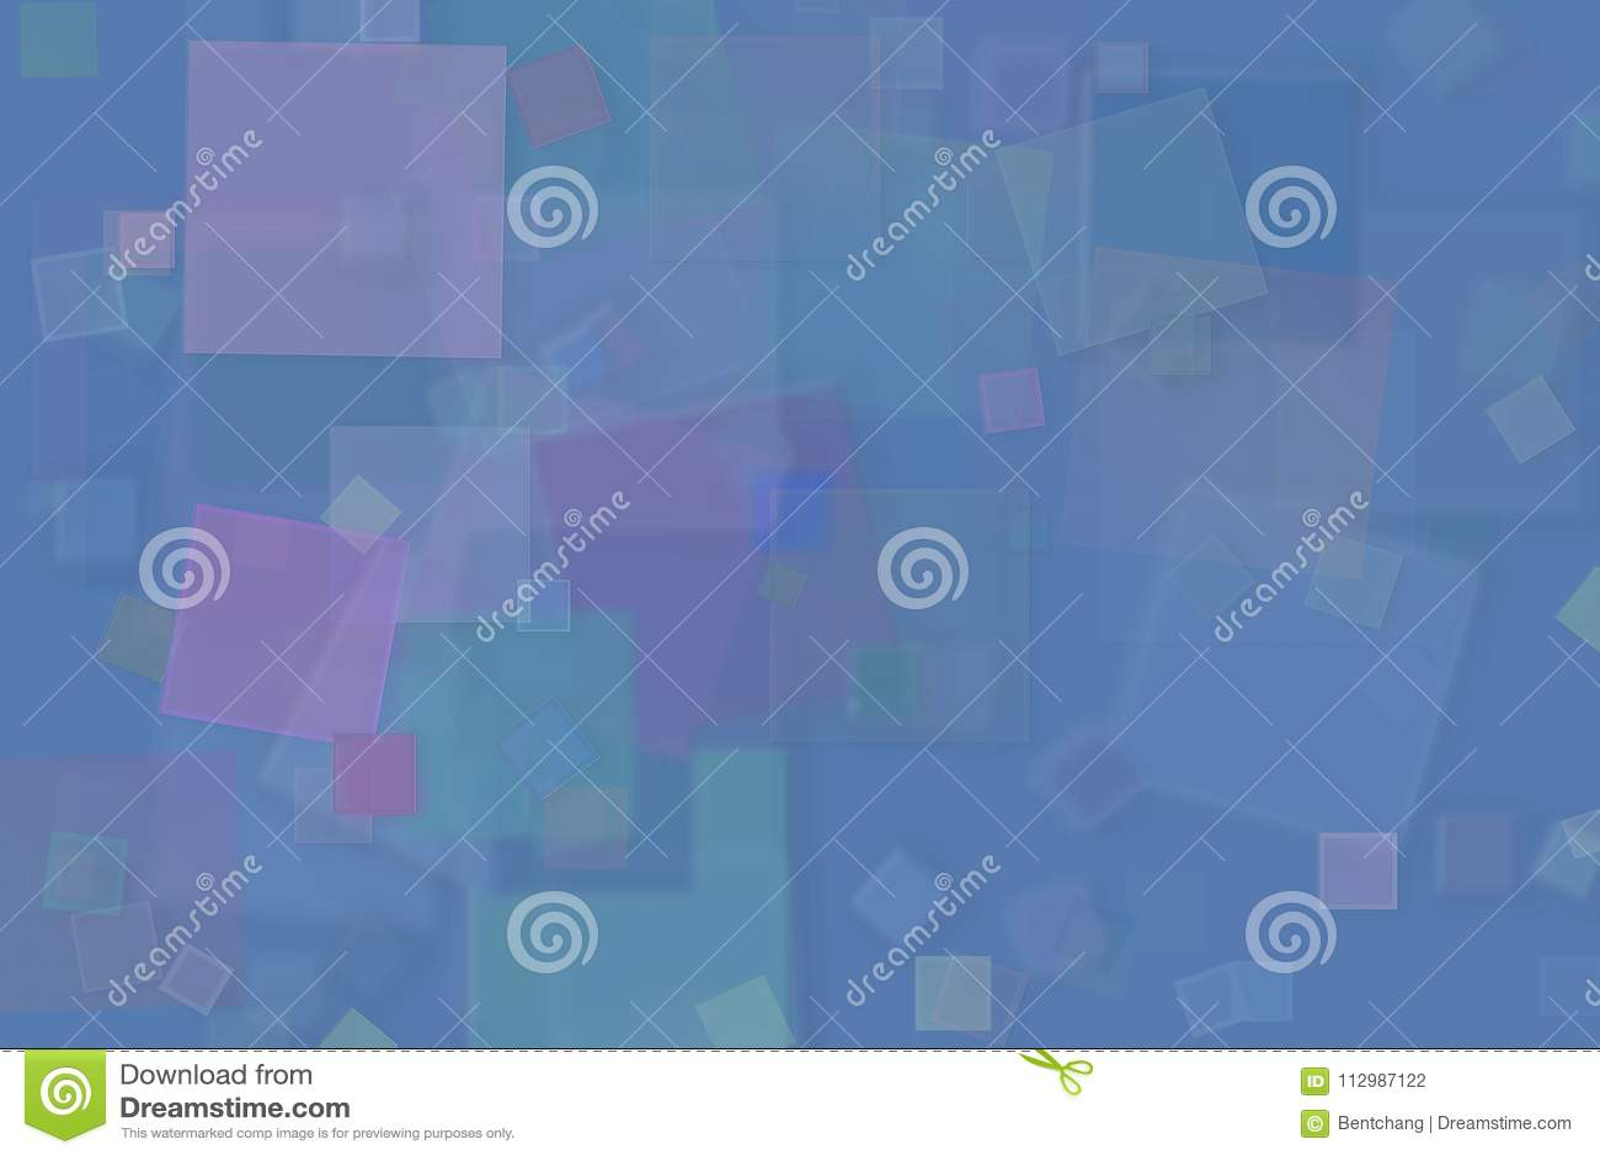 Abstract shape generative design art background. Pattern, emboss, wallpaper, rectangle & style.